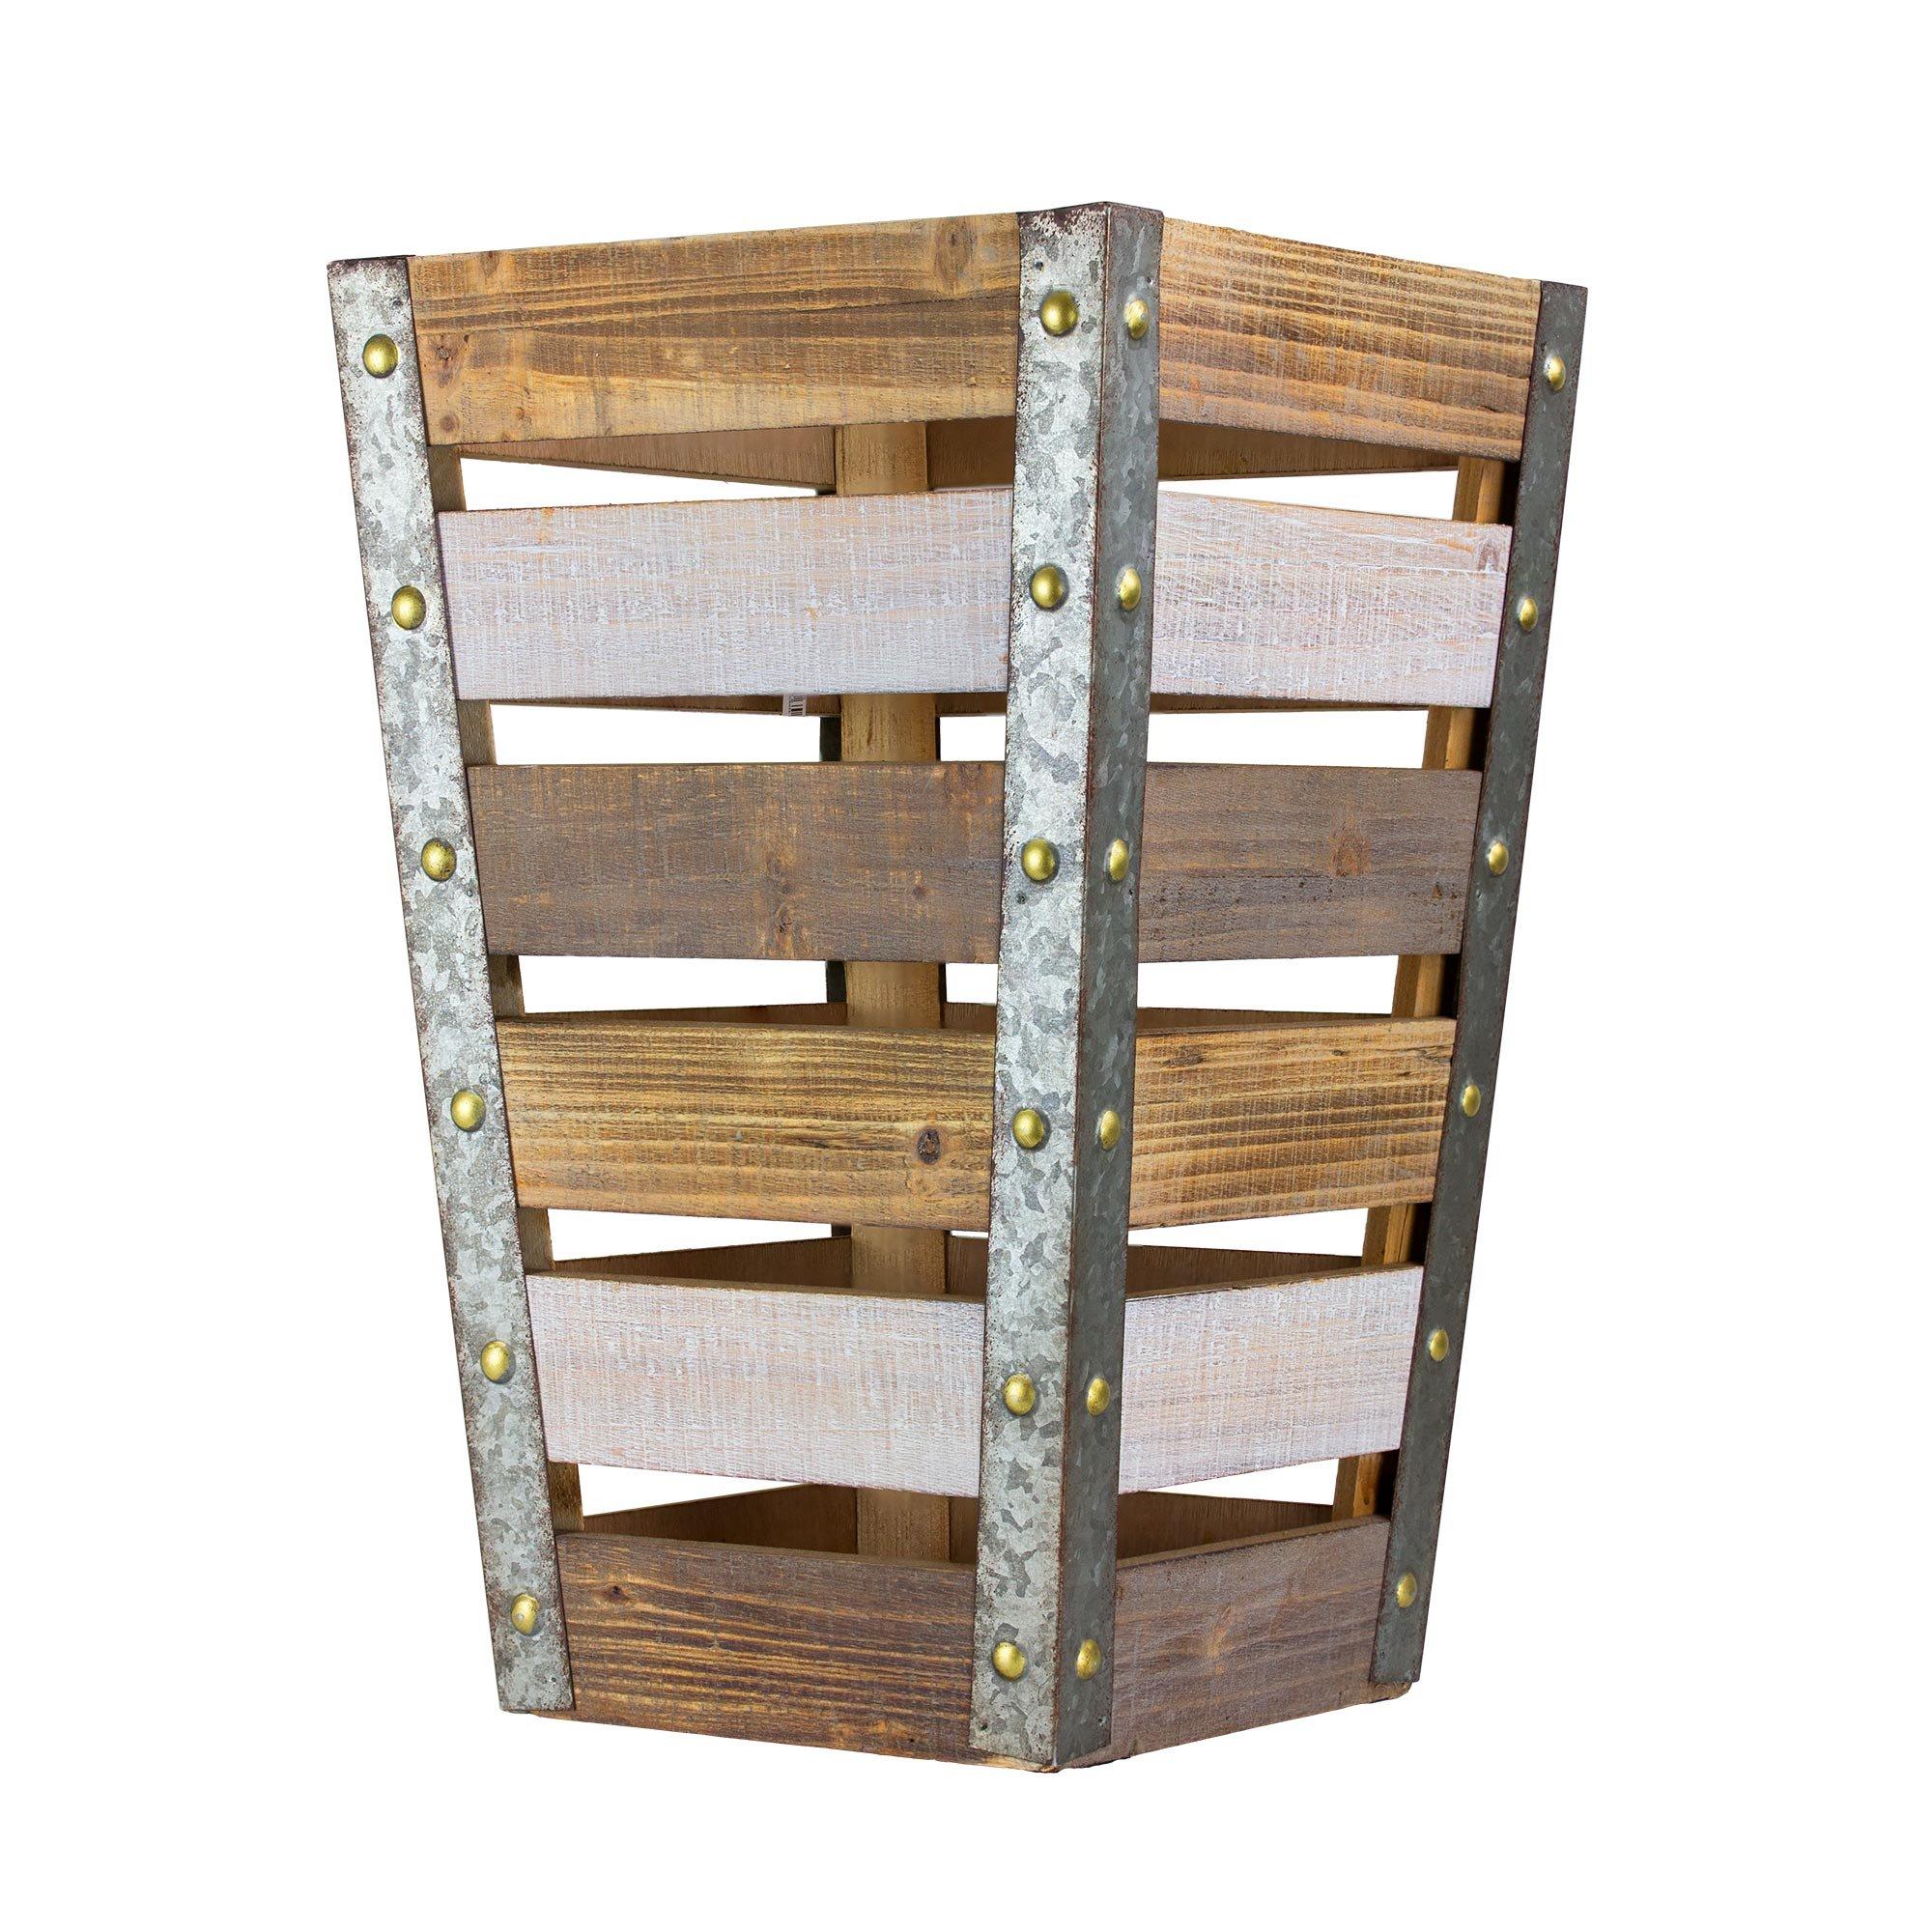 American Art Decor Rustic Tapered Wooden Storage Crate Vintage Farmhouse Decor - Medium